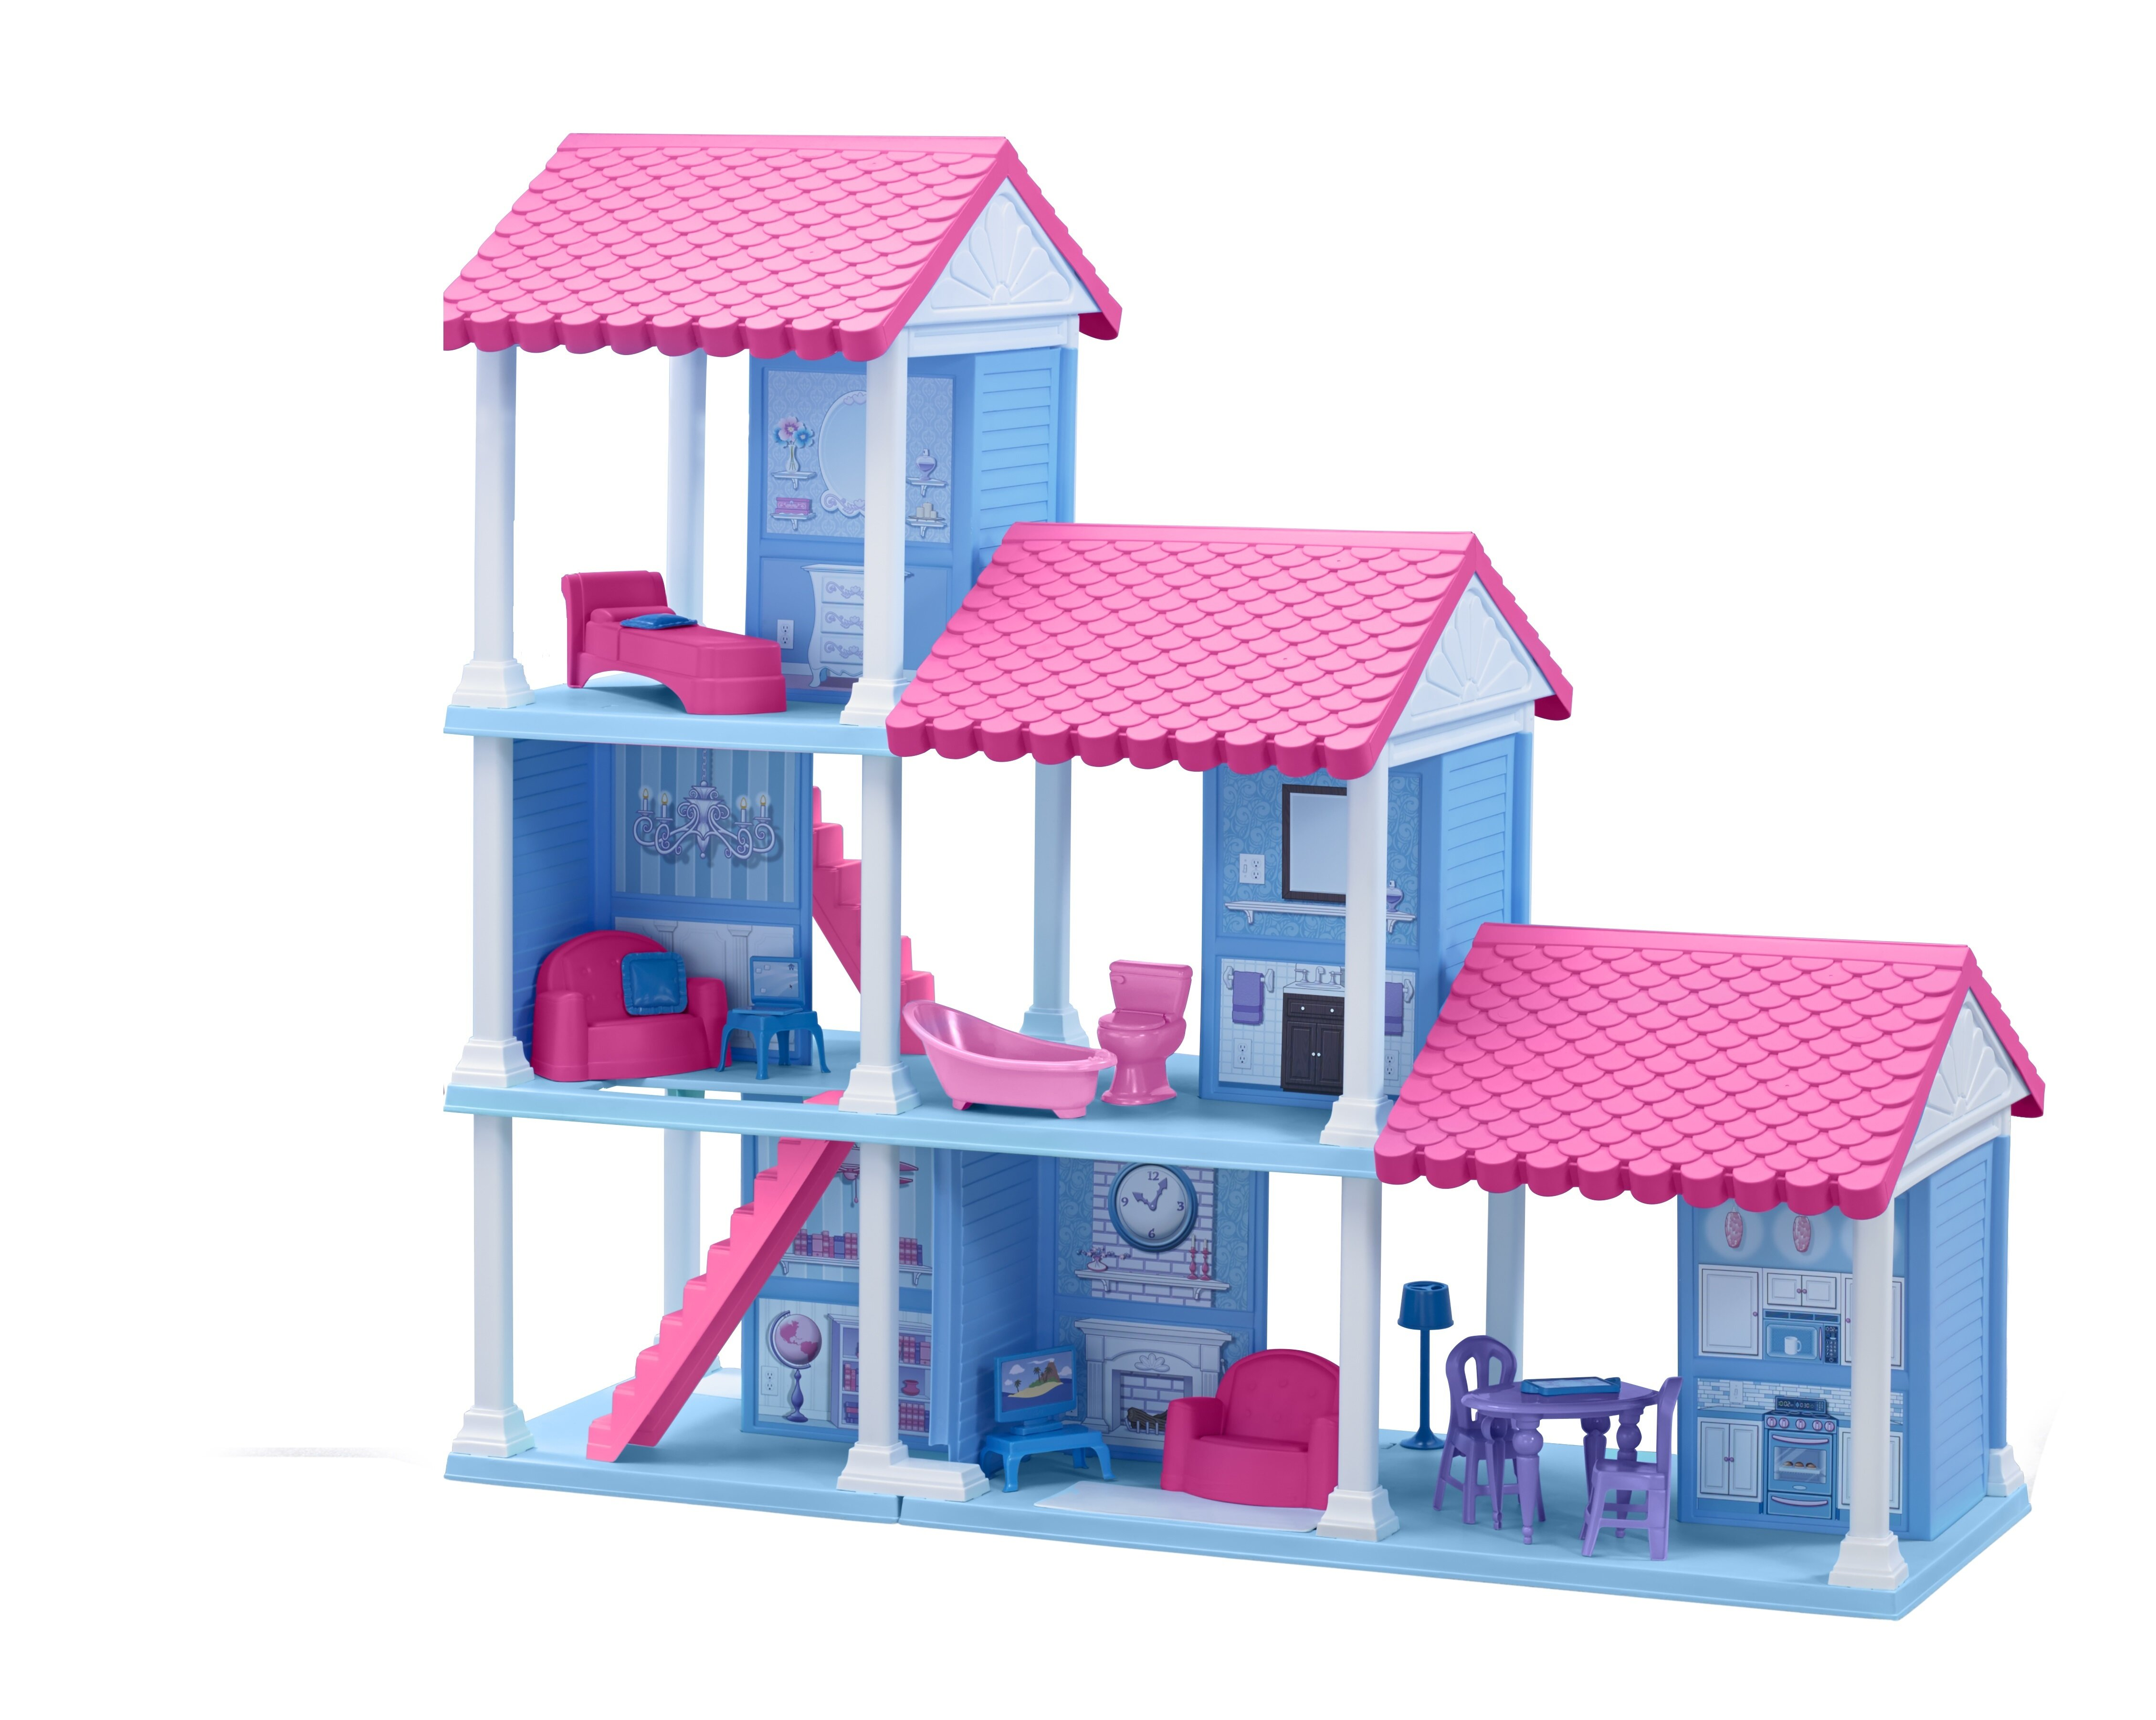 American Plastic Toys 25 Piece Delightful Dollhouse Set Reviews